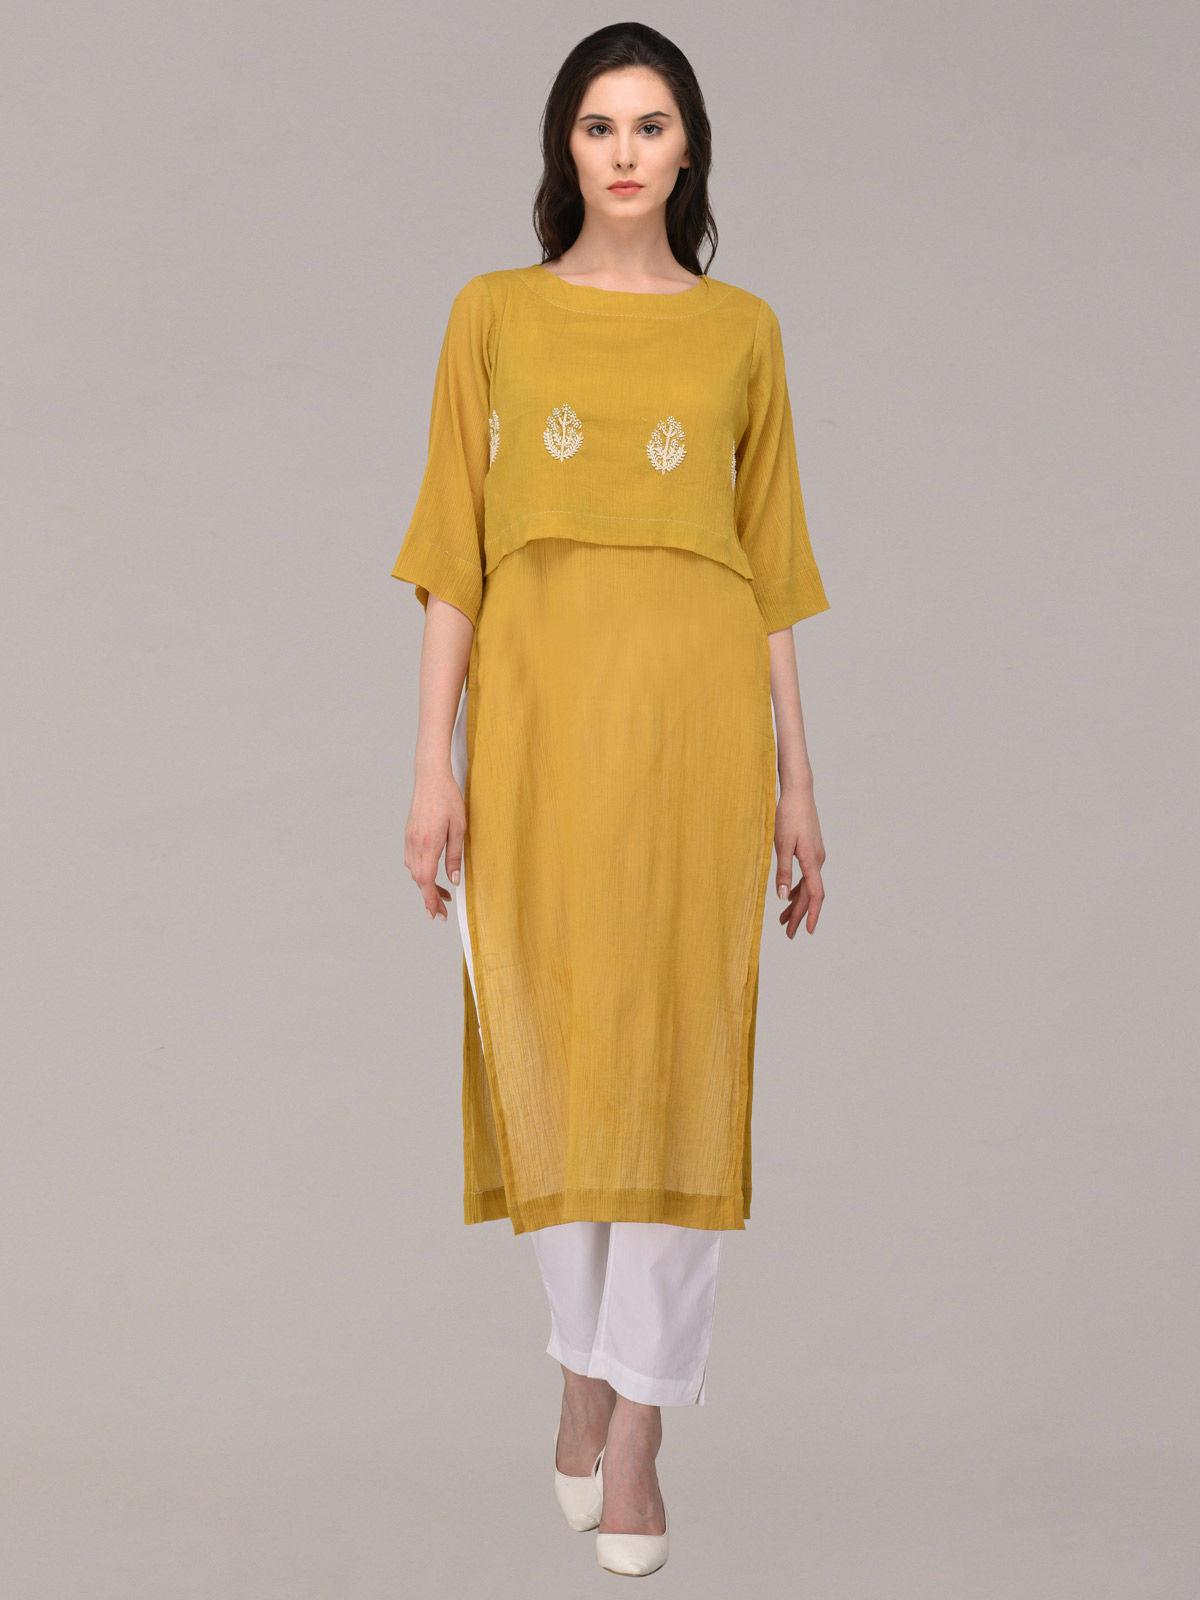 Panachee hand embroidered mustard pure cotton kurti